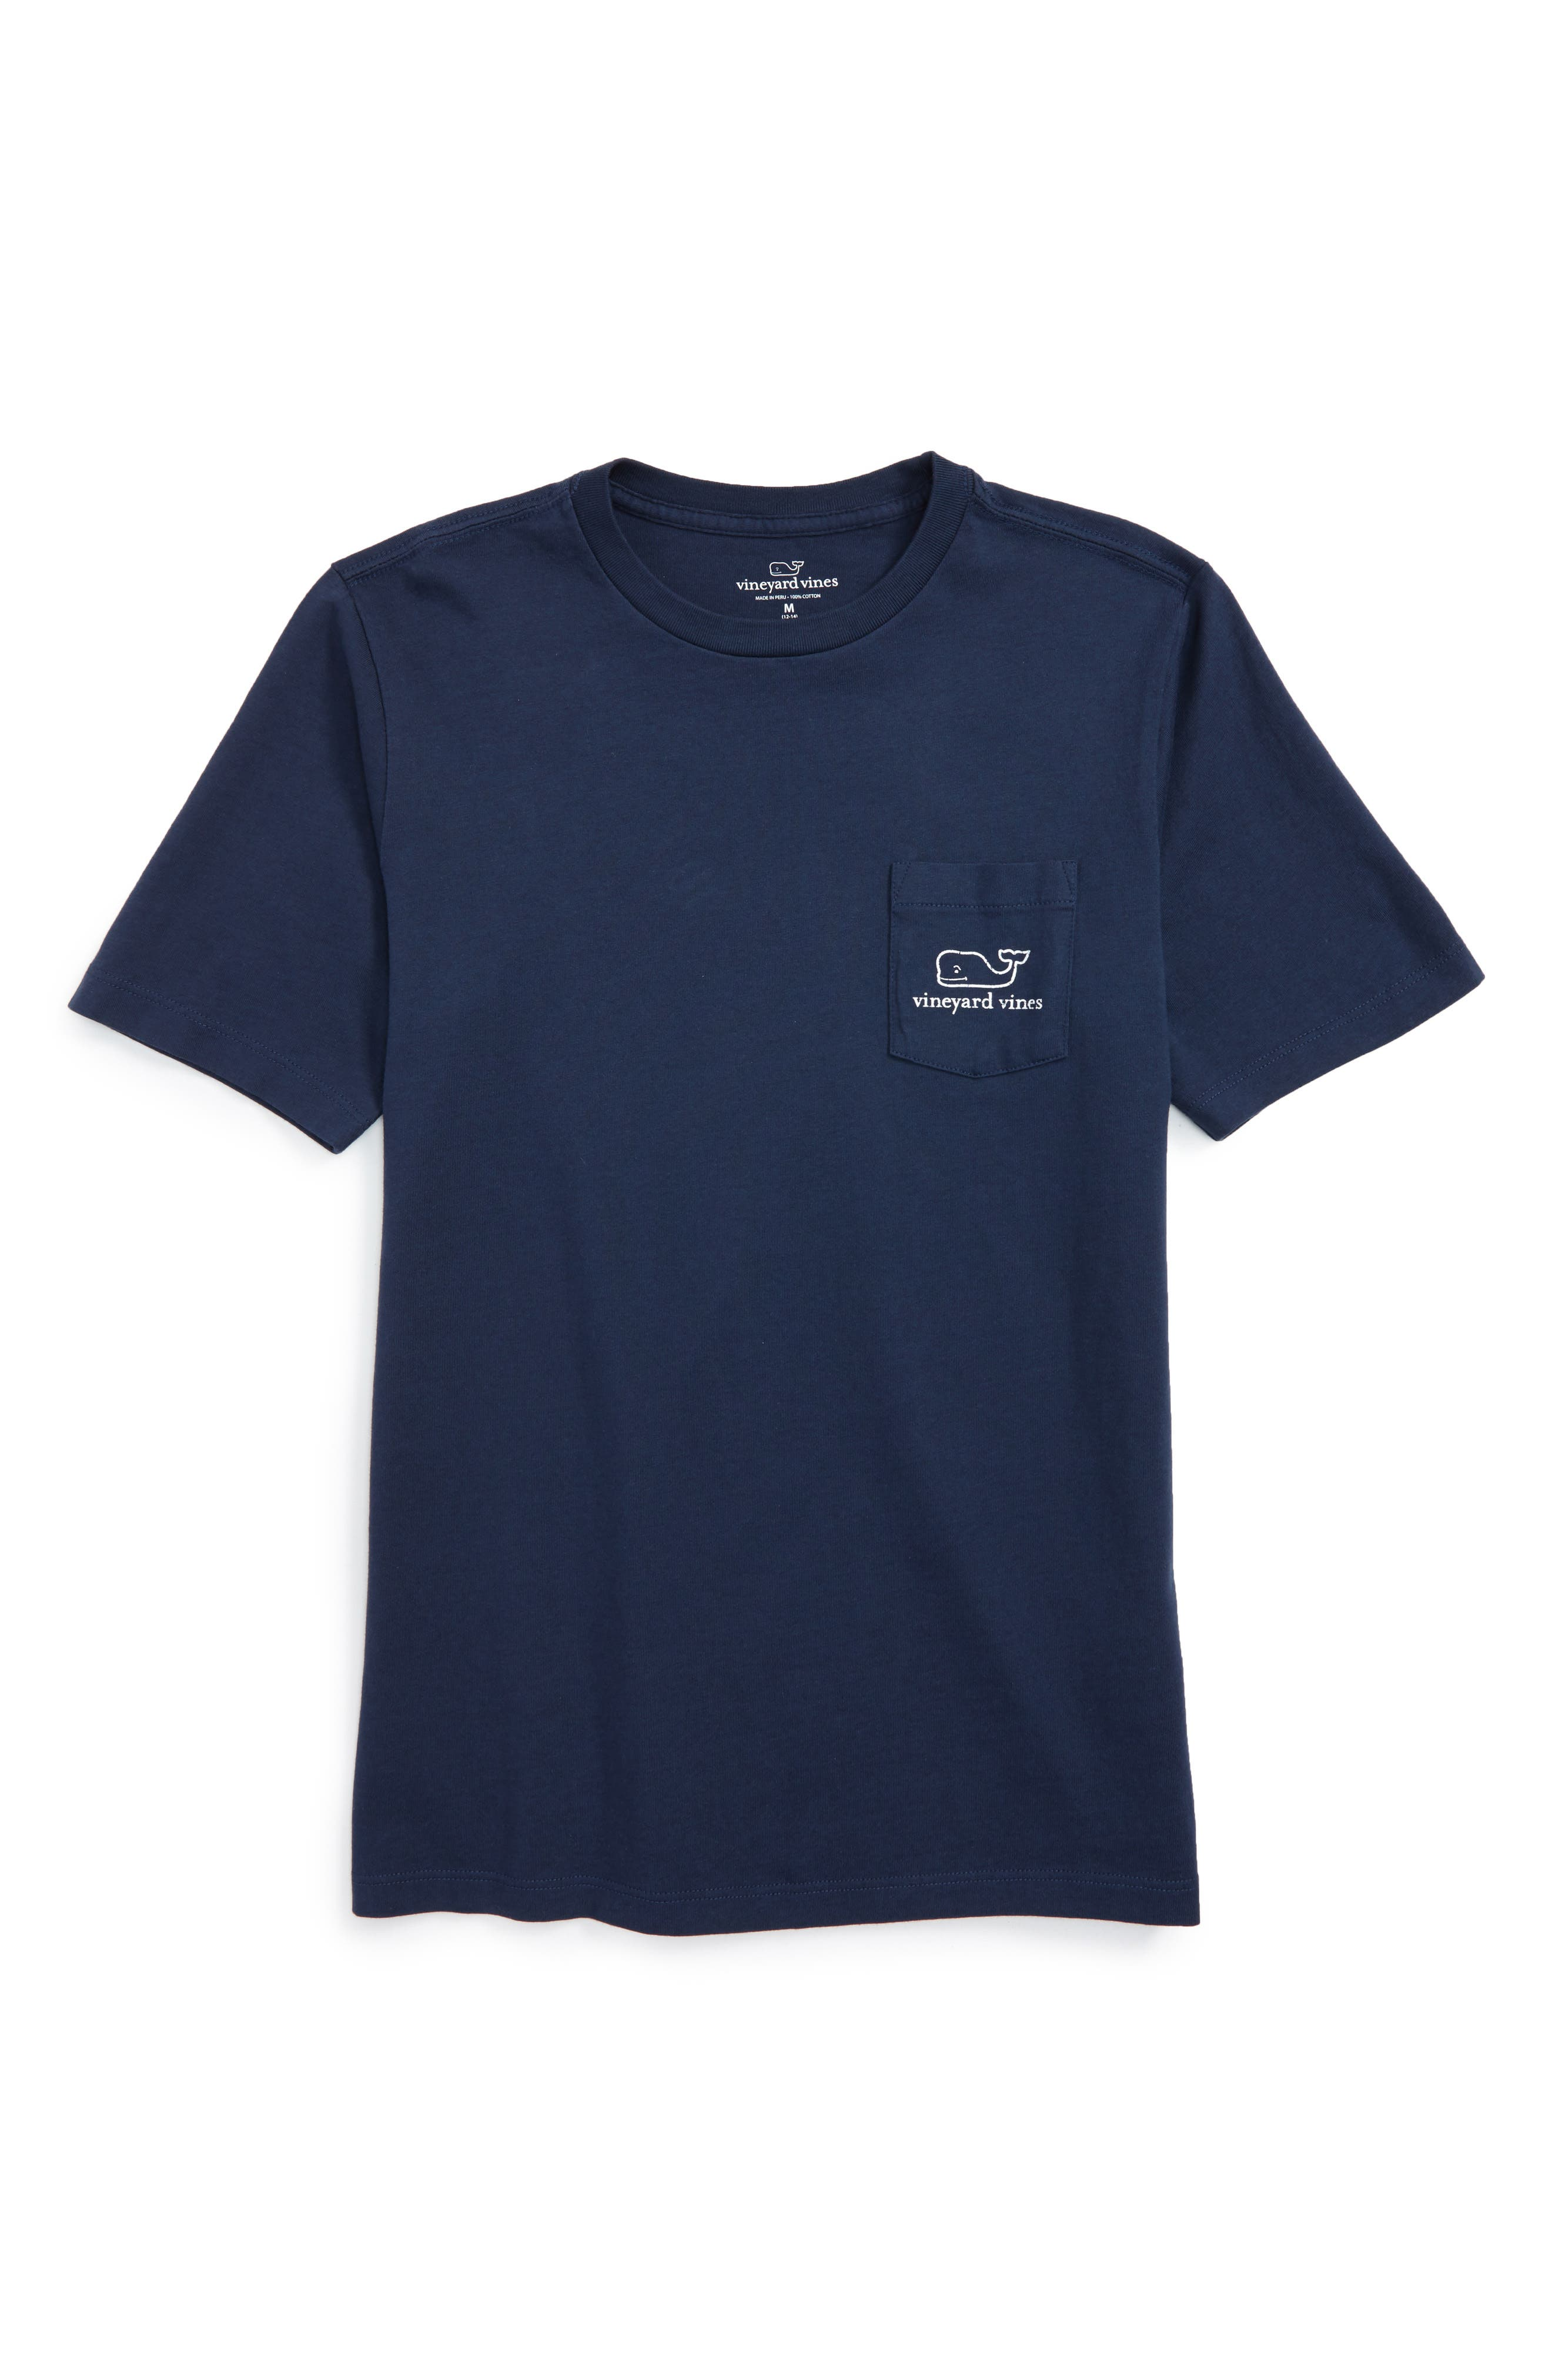 Alternate Image 1 Selected - vineyard vines Vintage Whale Pocket T-Shirt (Toddler Boys & Little Boys)